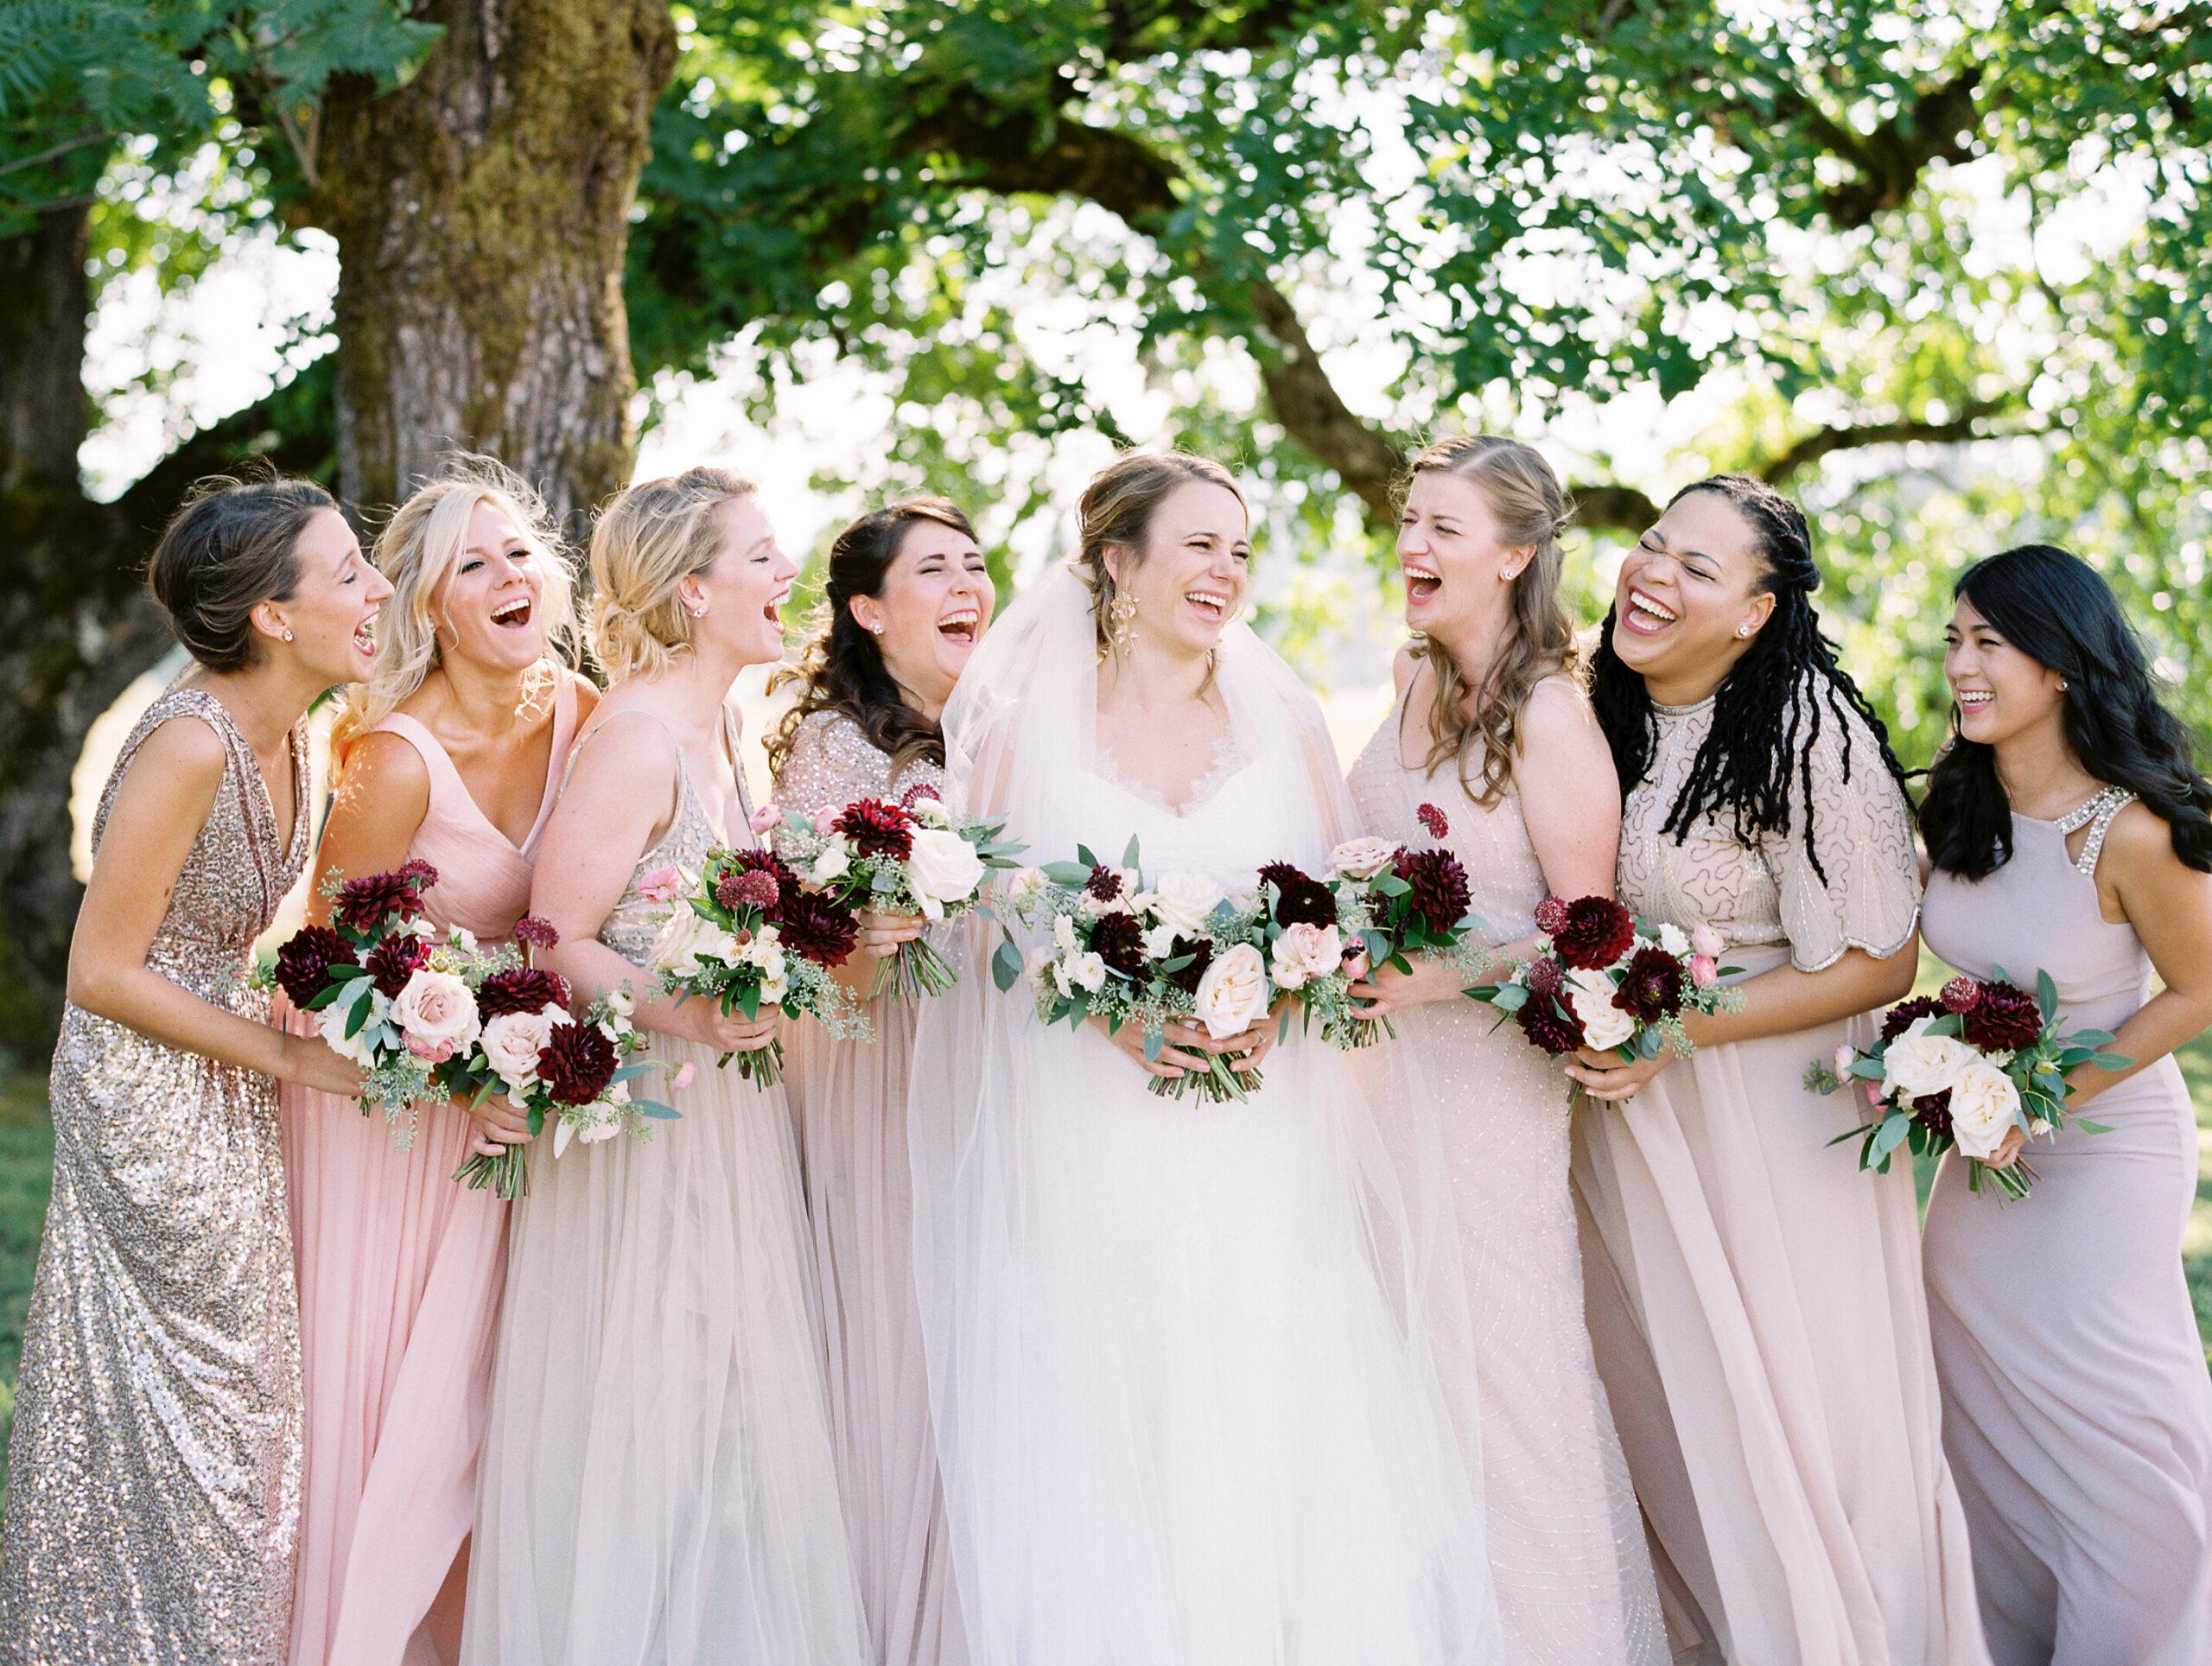 Sweetlife Photography // Tin Roof Barn Weddings and Events